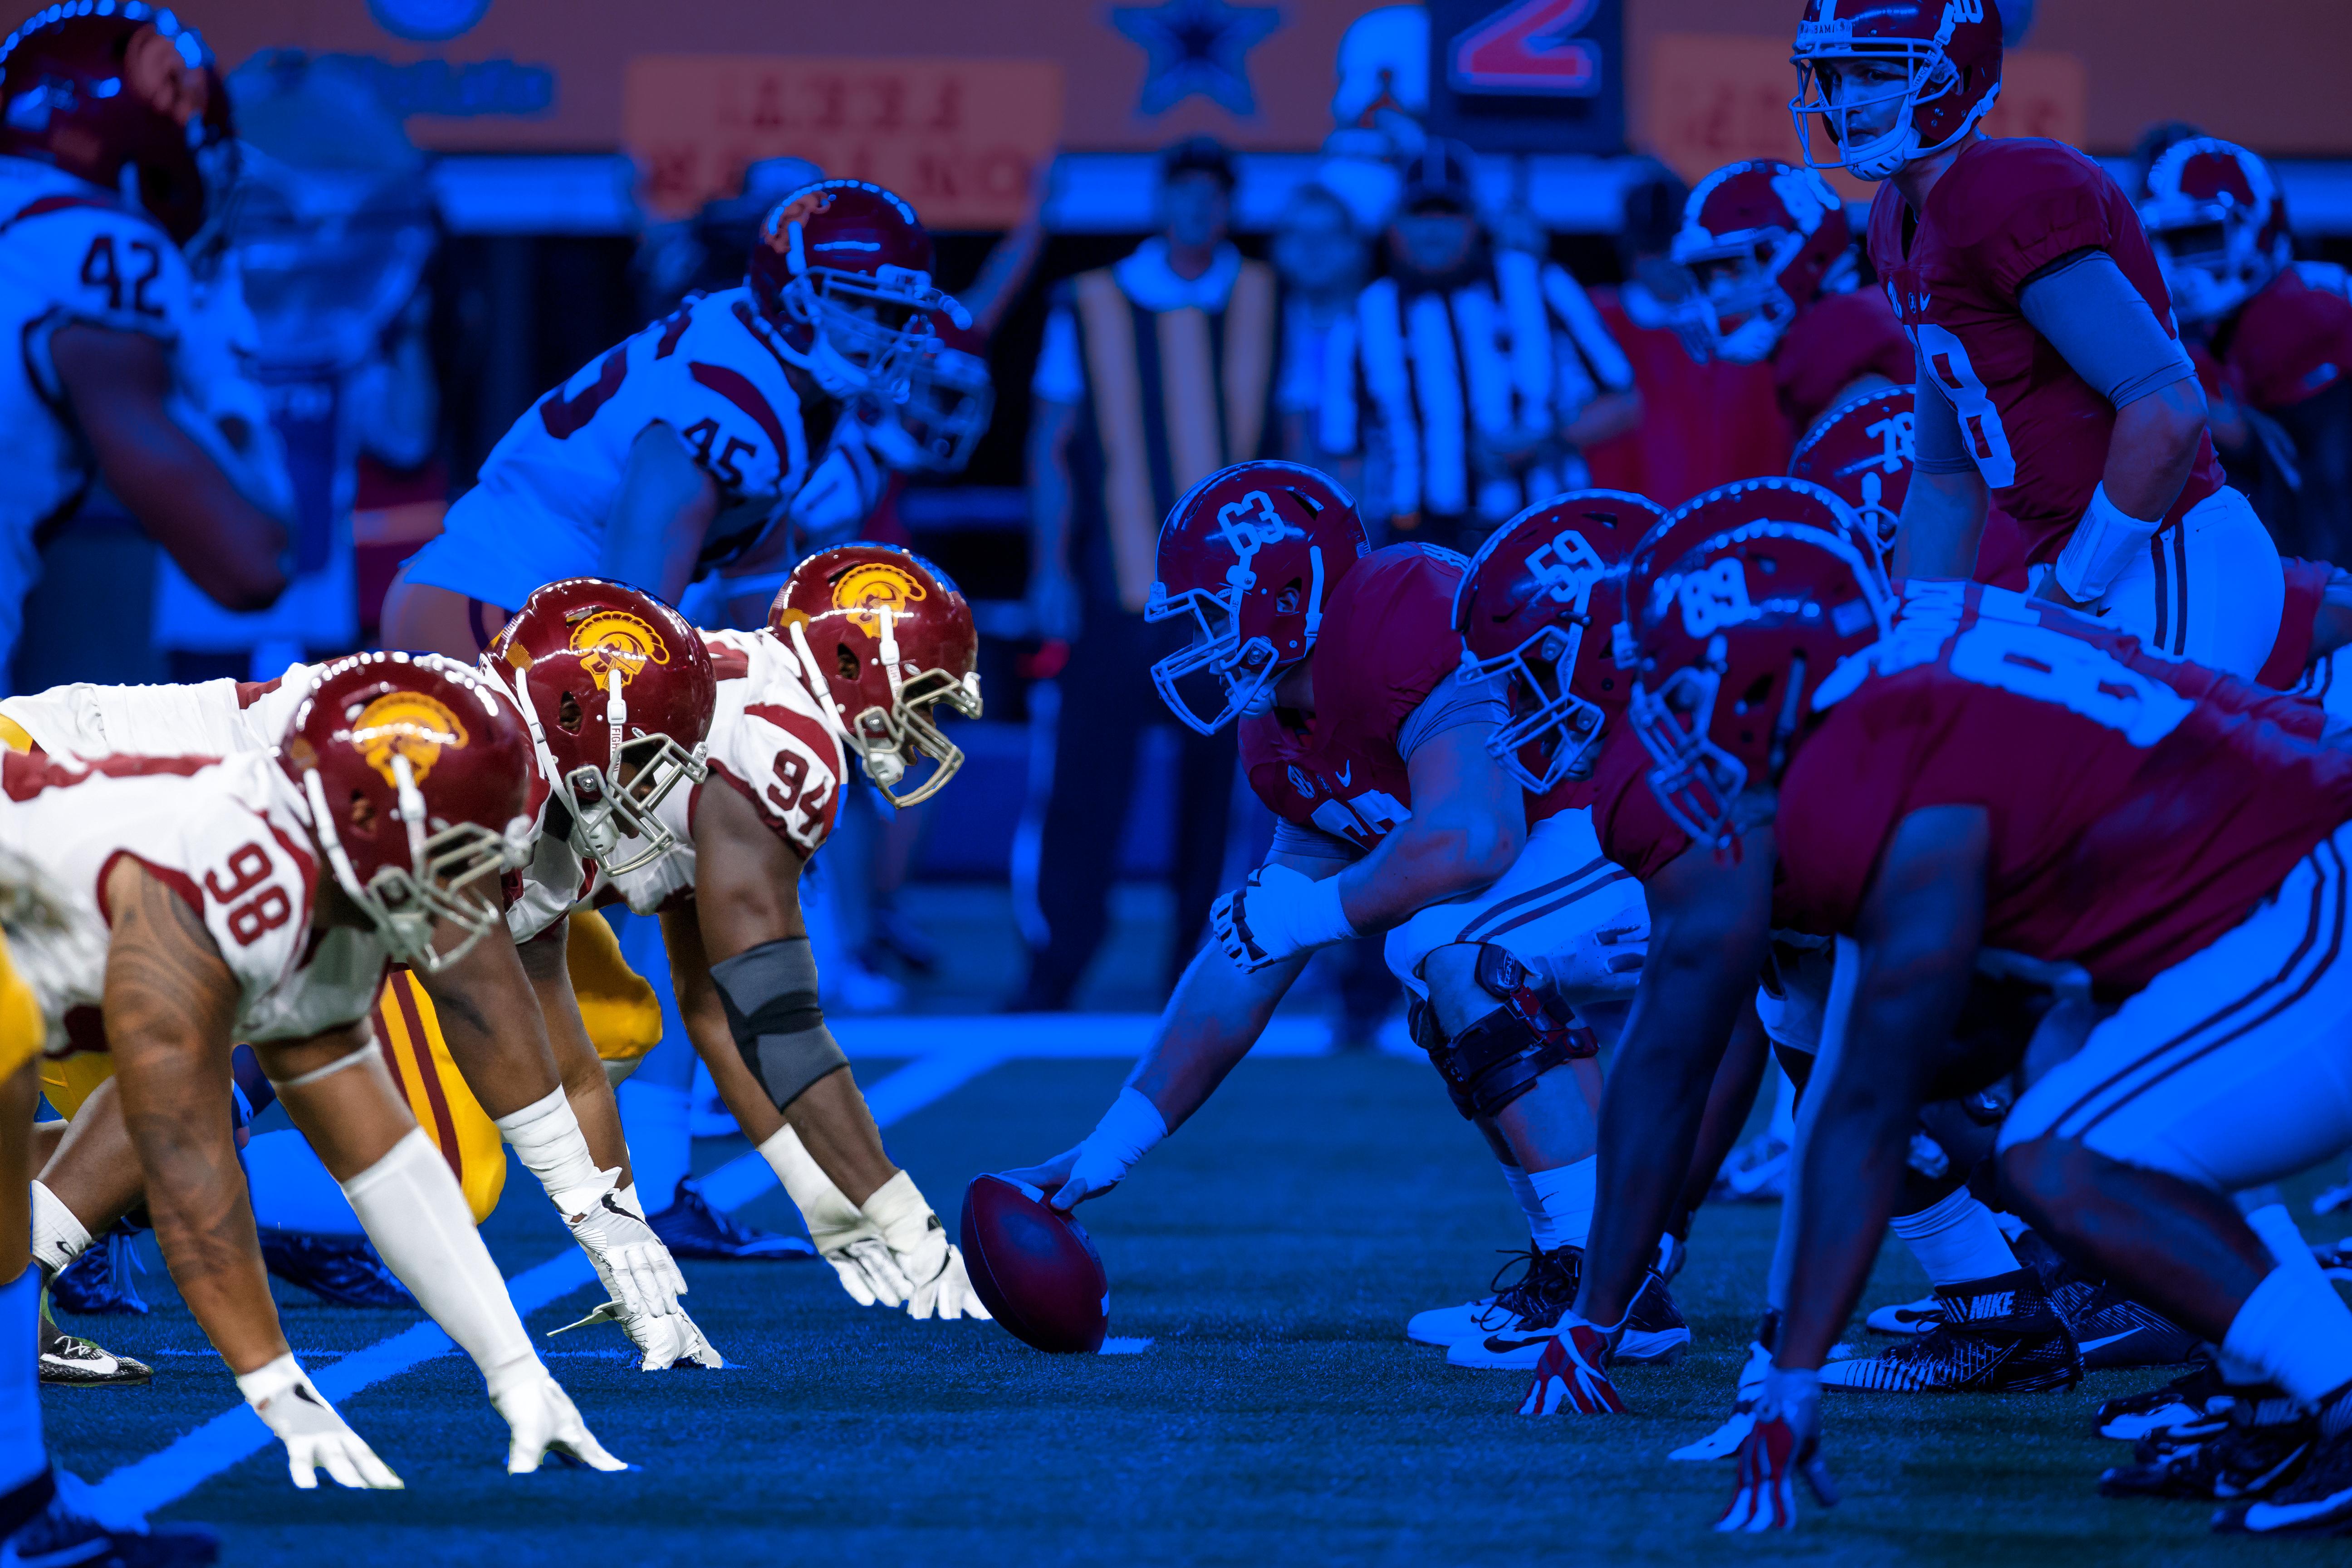 USC defensive linemen vs. Alabama